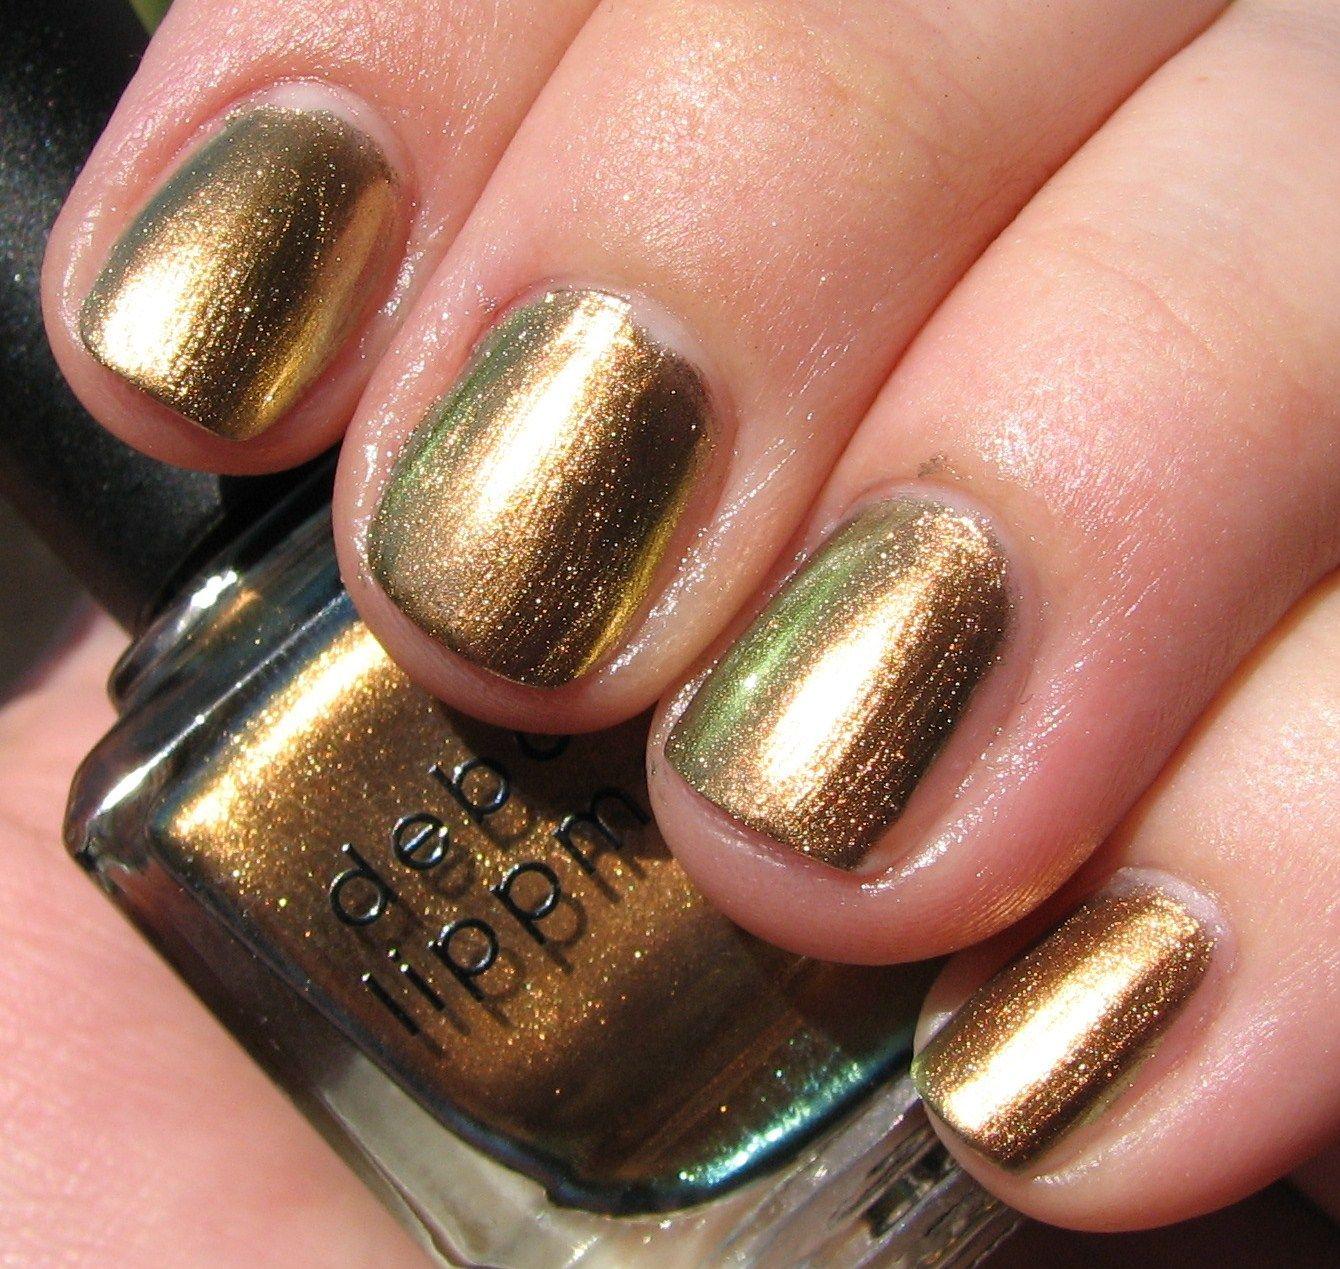 Nail Polish That Looks Like Chrome: Deborah Lippmann SWAGGA LIKE US Nail Polish Swatches